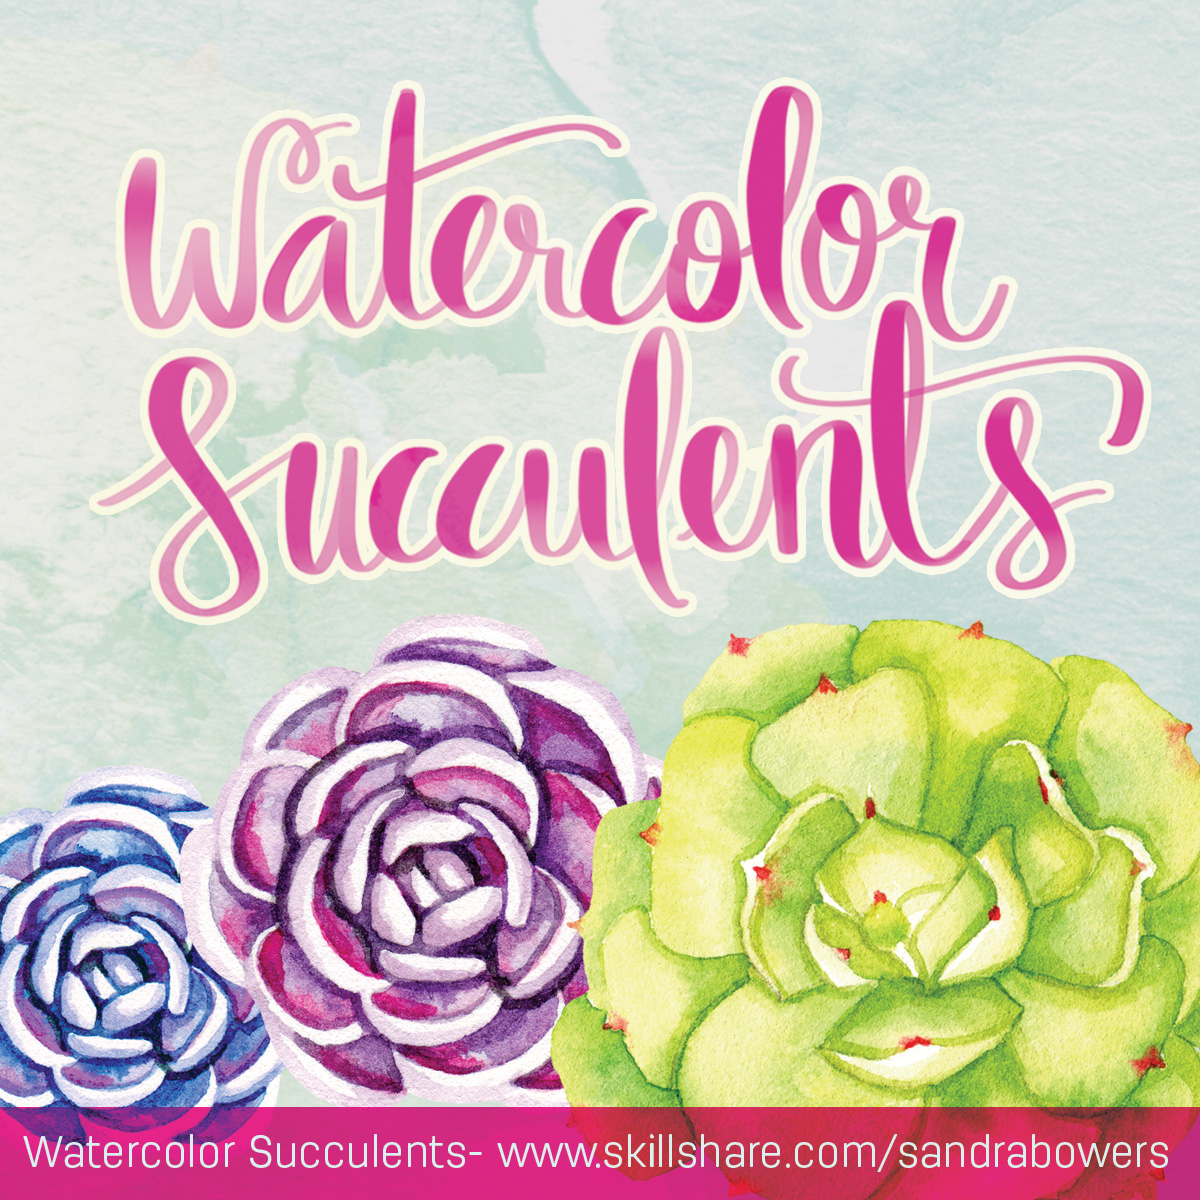 Watercolor Succulents SandraBowers